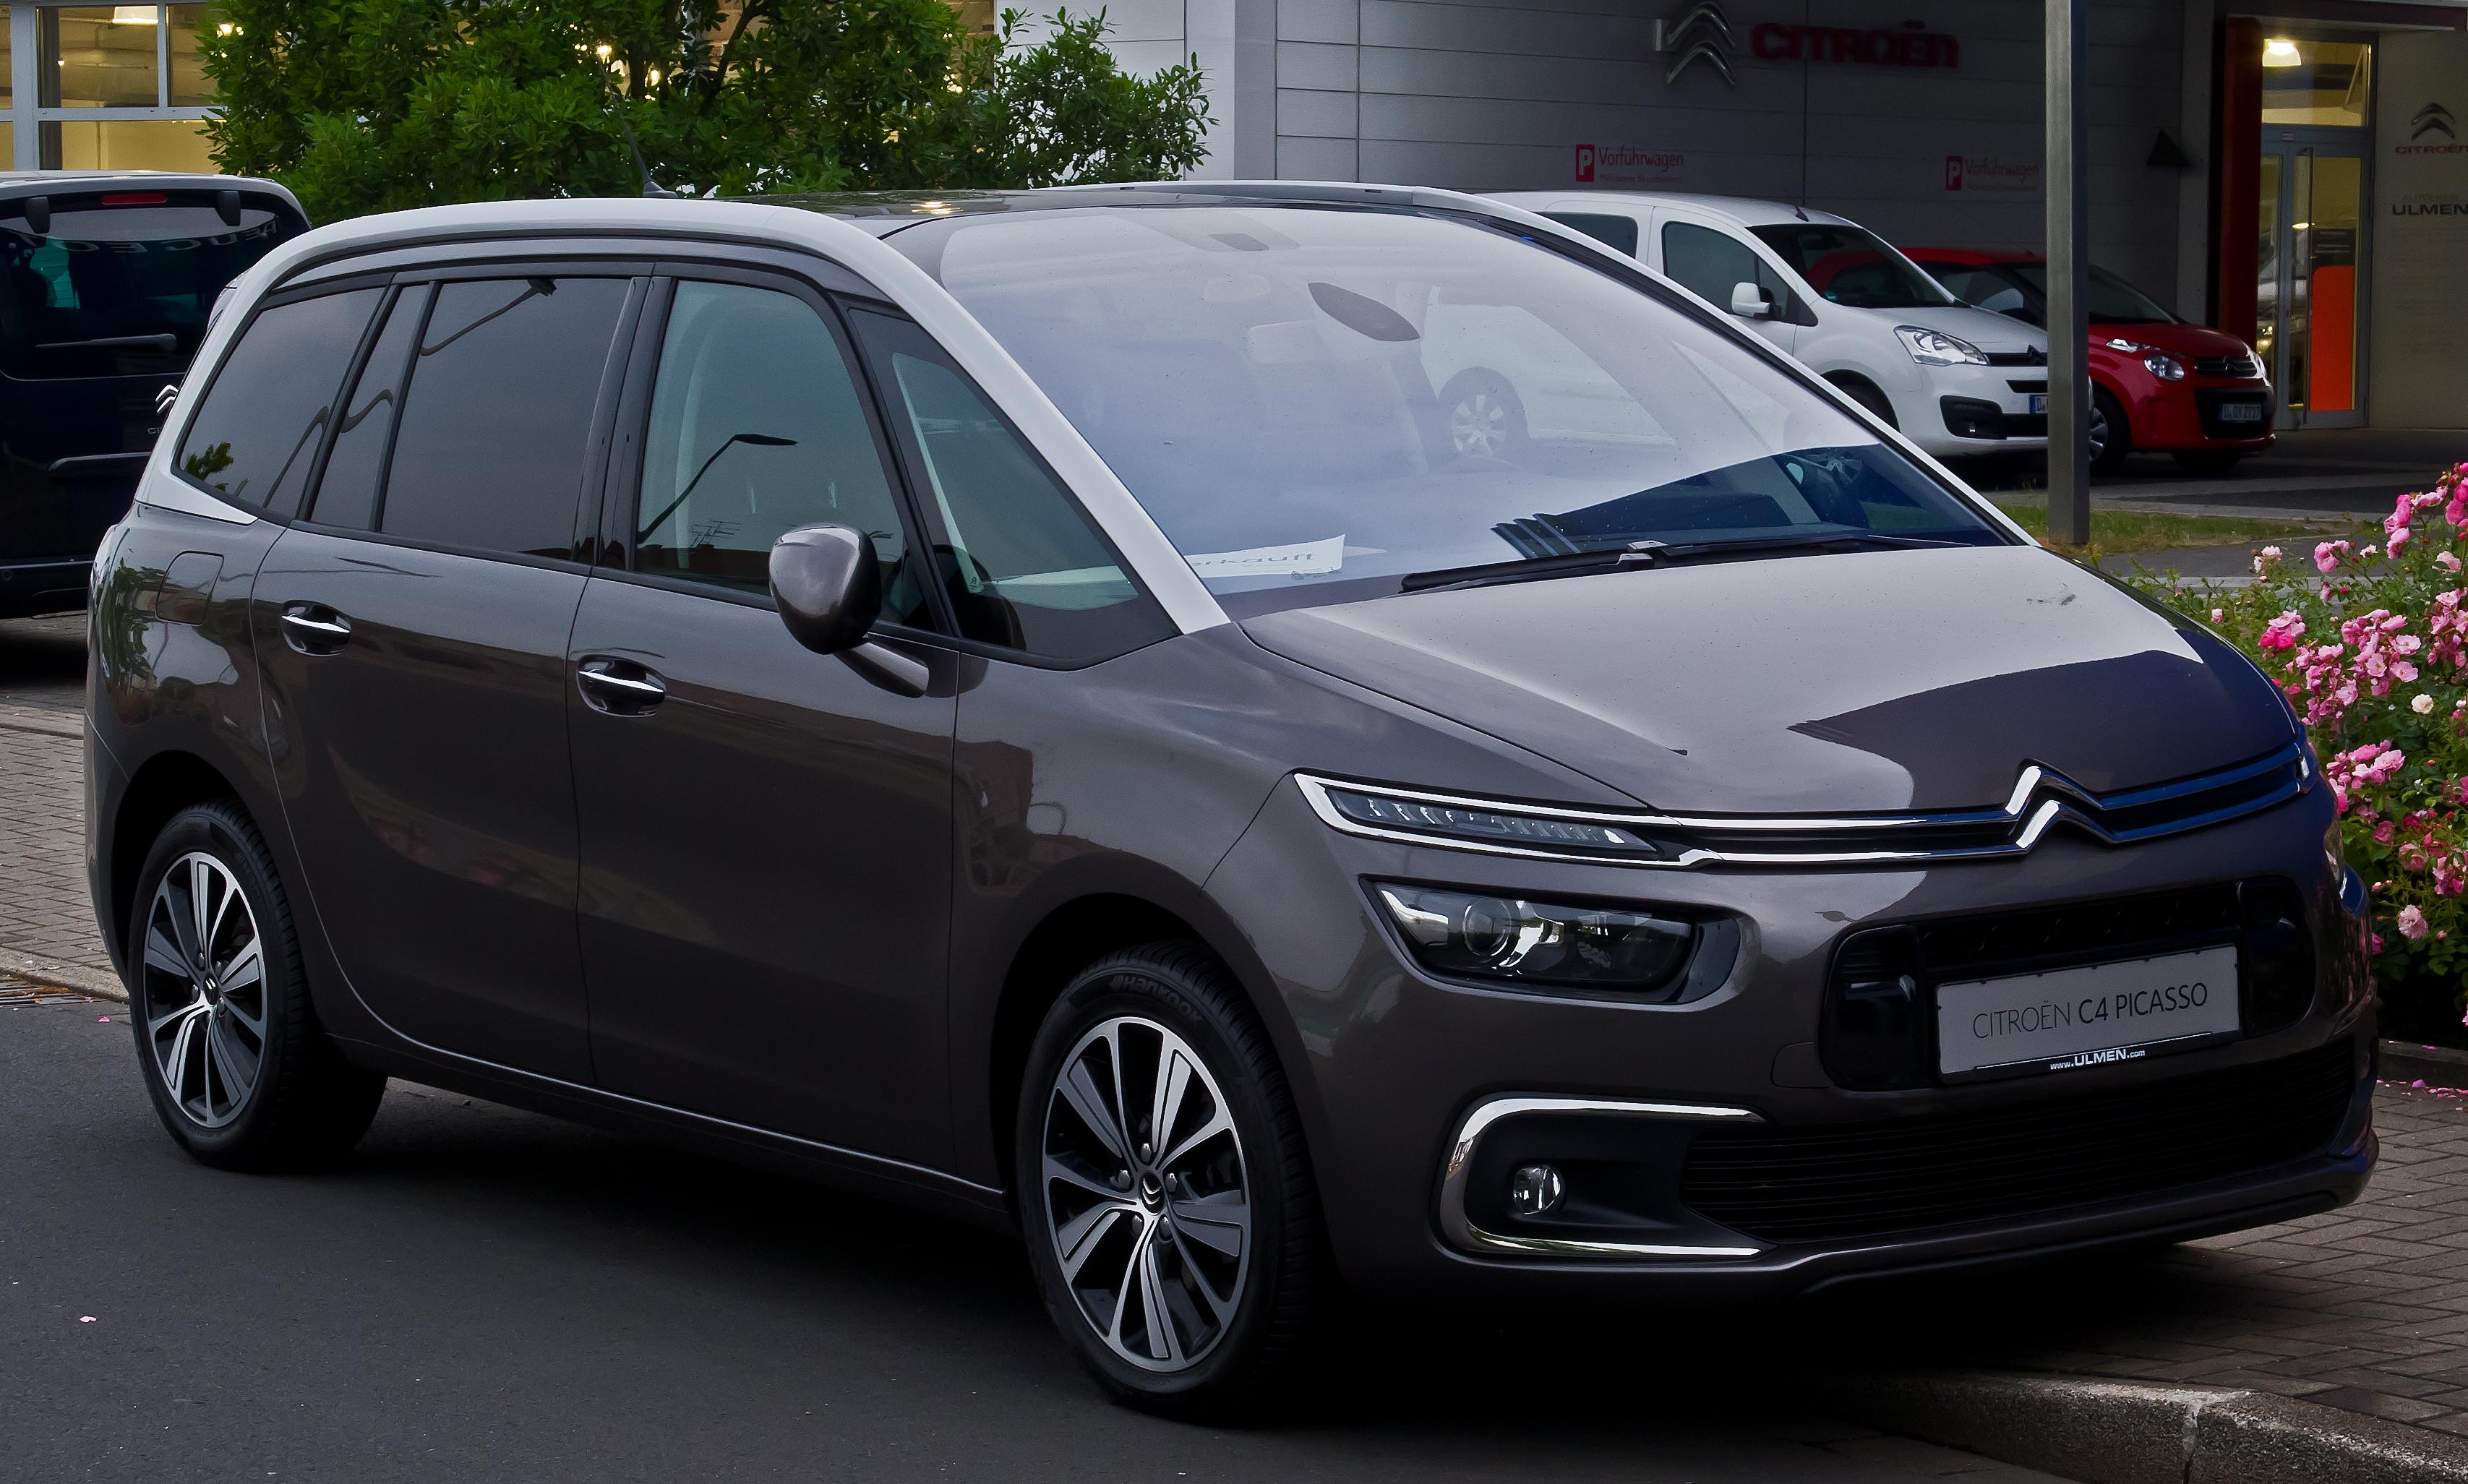 File:Citroën Grand C4 Picasso (II, Facelift ...